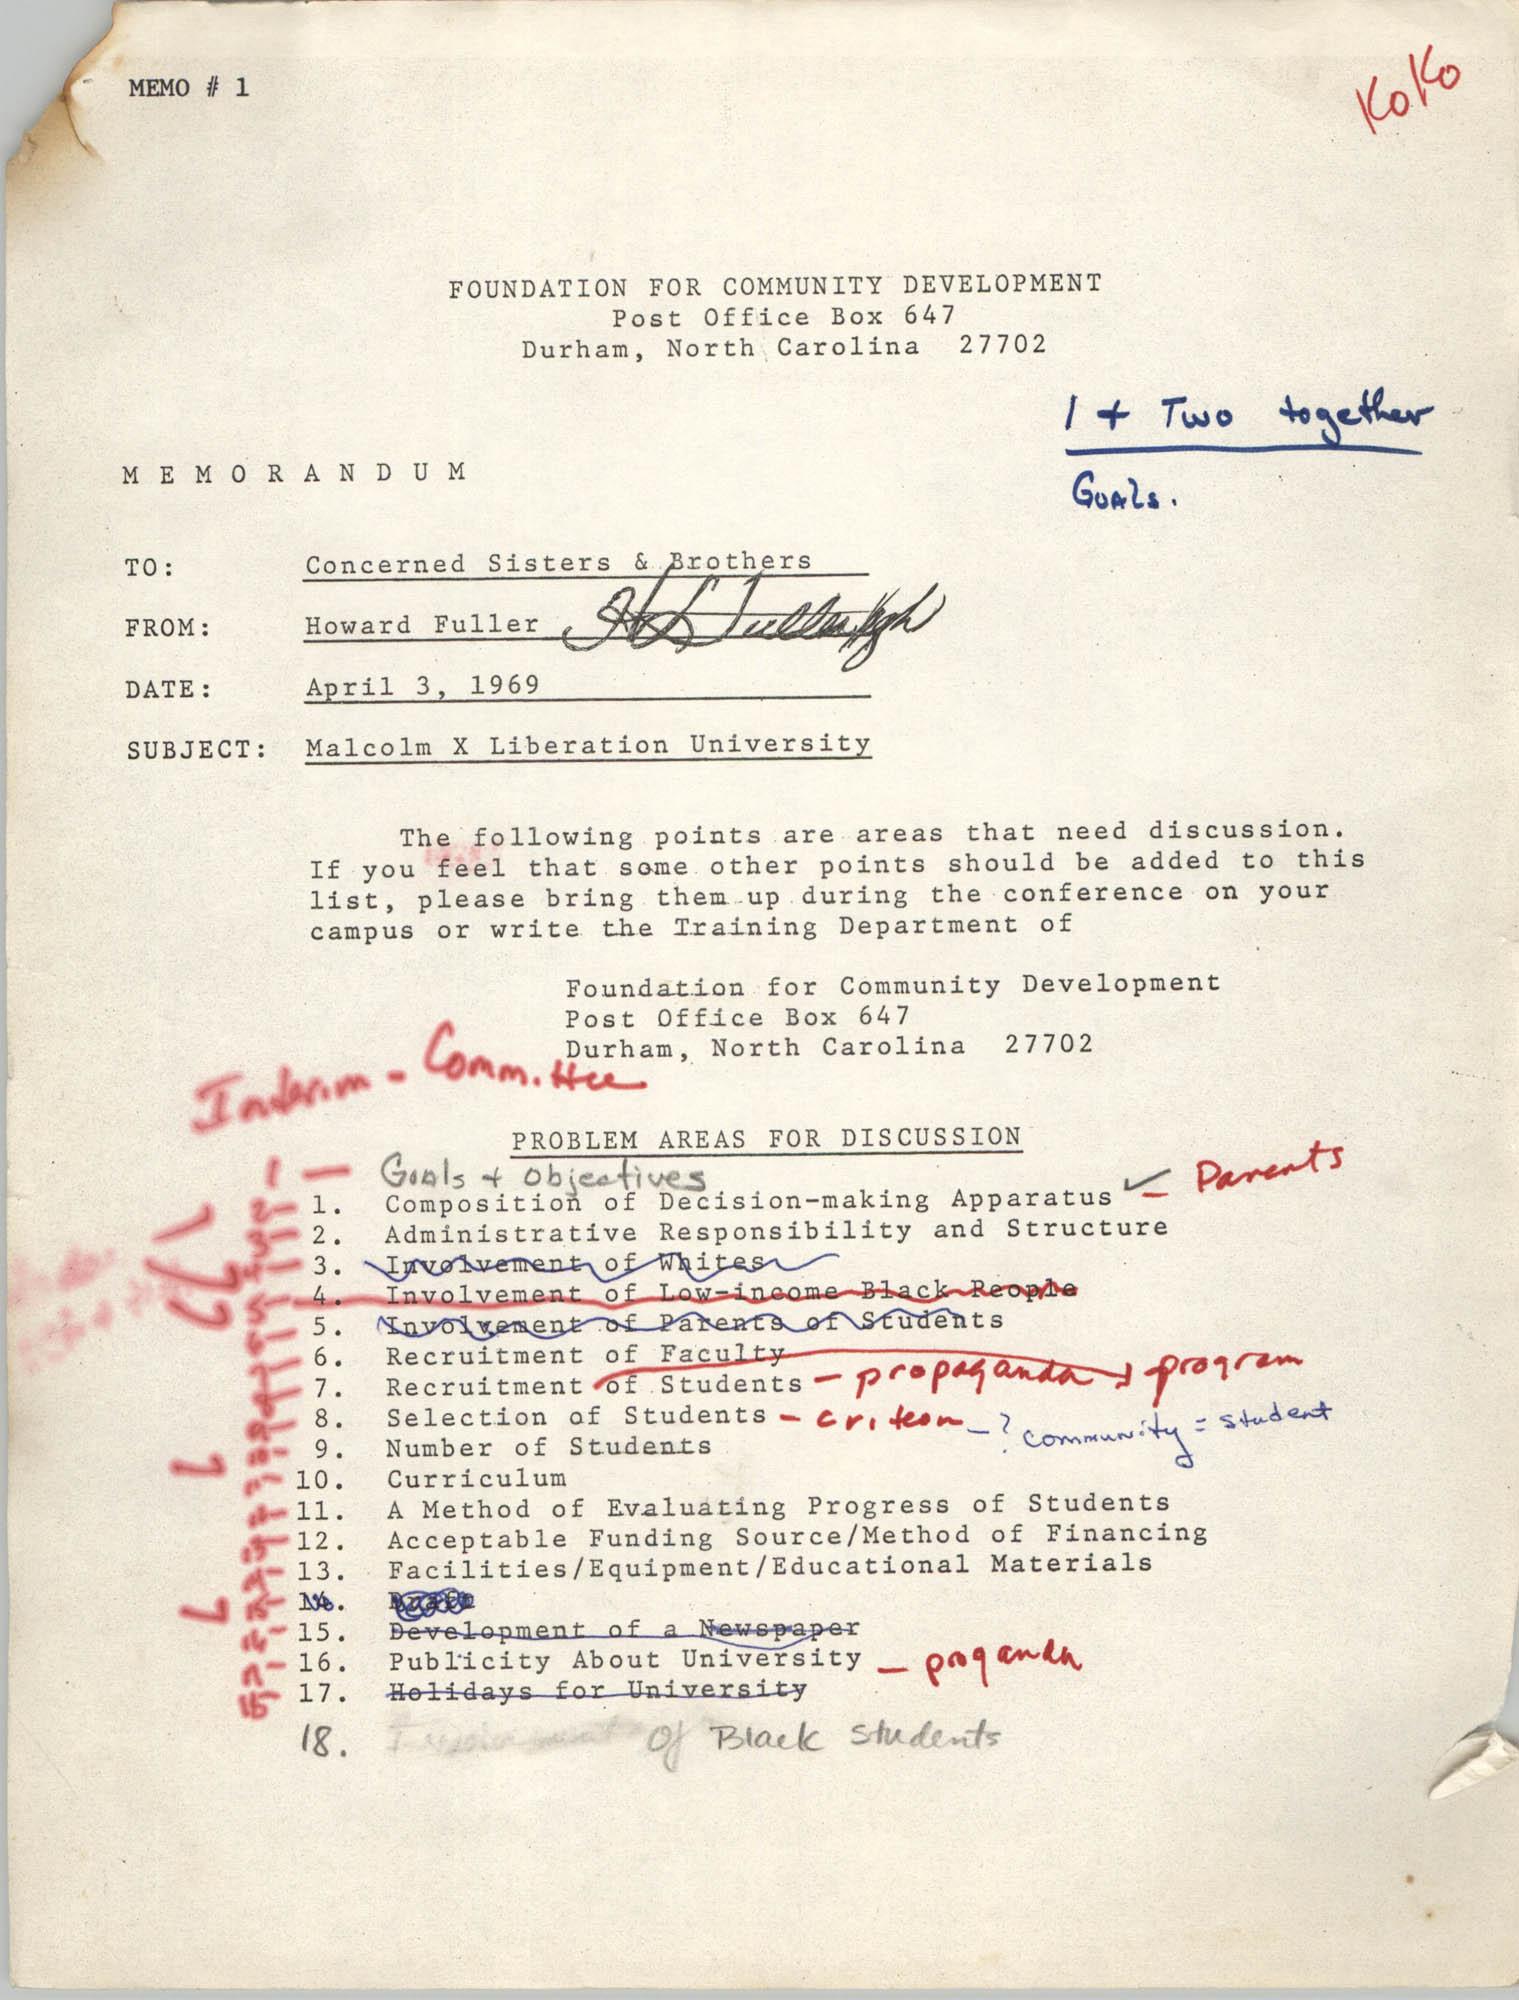 Malcolm X Liberation University Memorandum, April 3, 1969